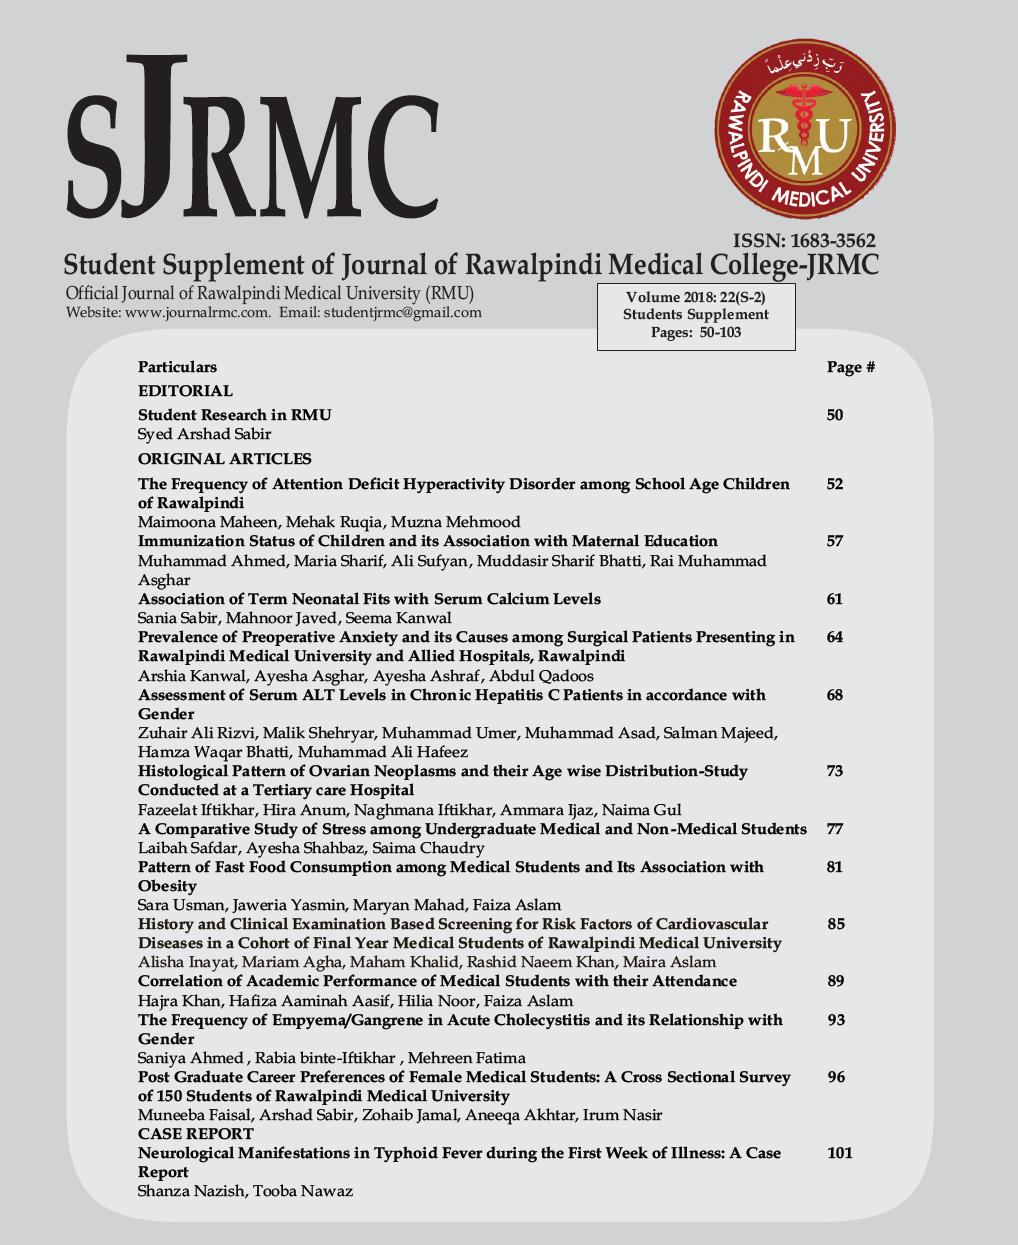 Vol 22 No S-2 (2018): Students Supplement | Journal of Rawalpindi